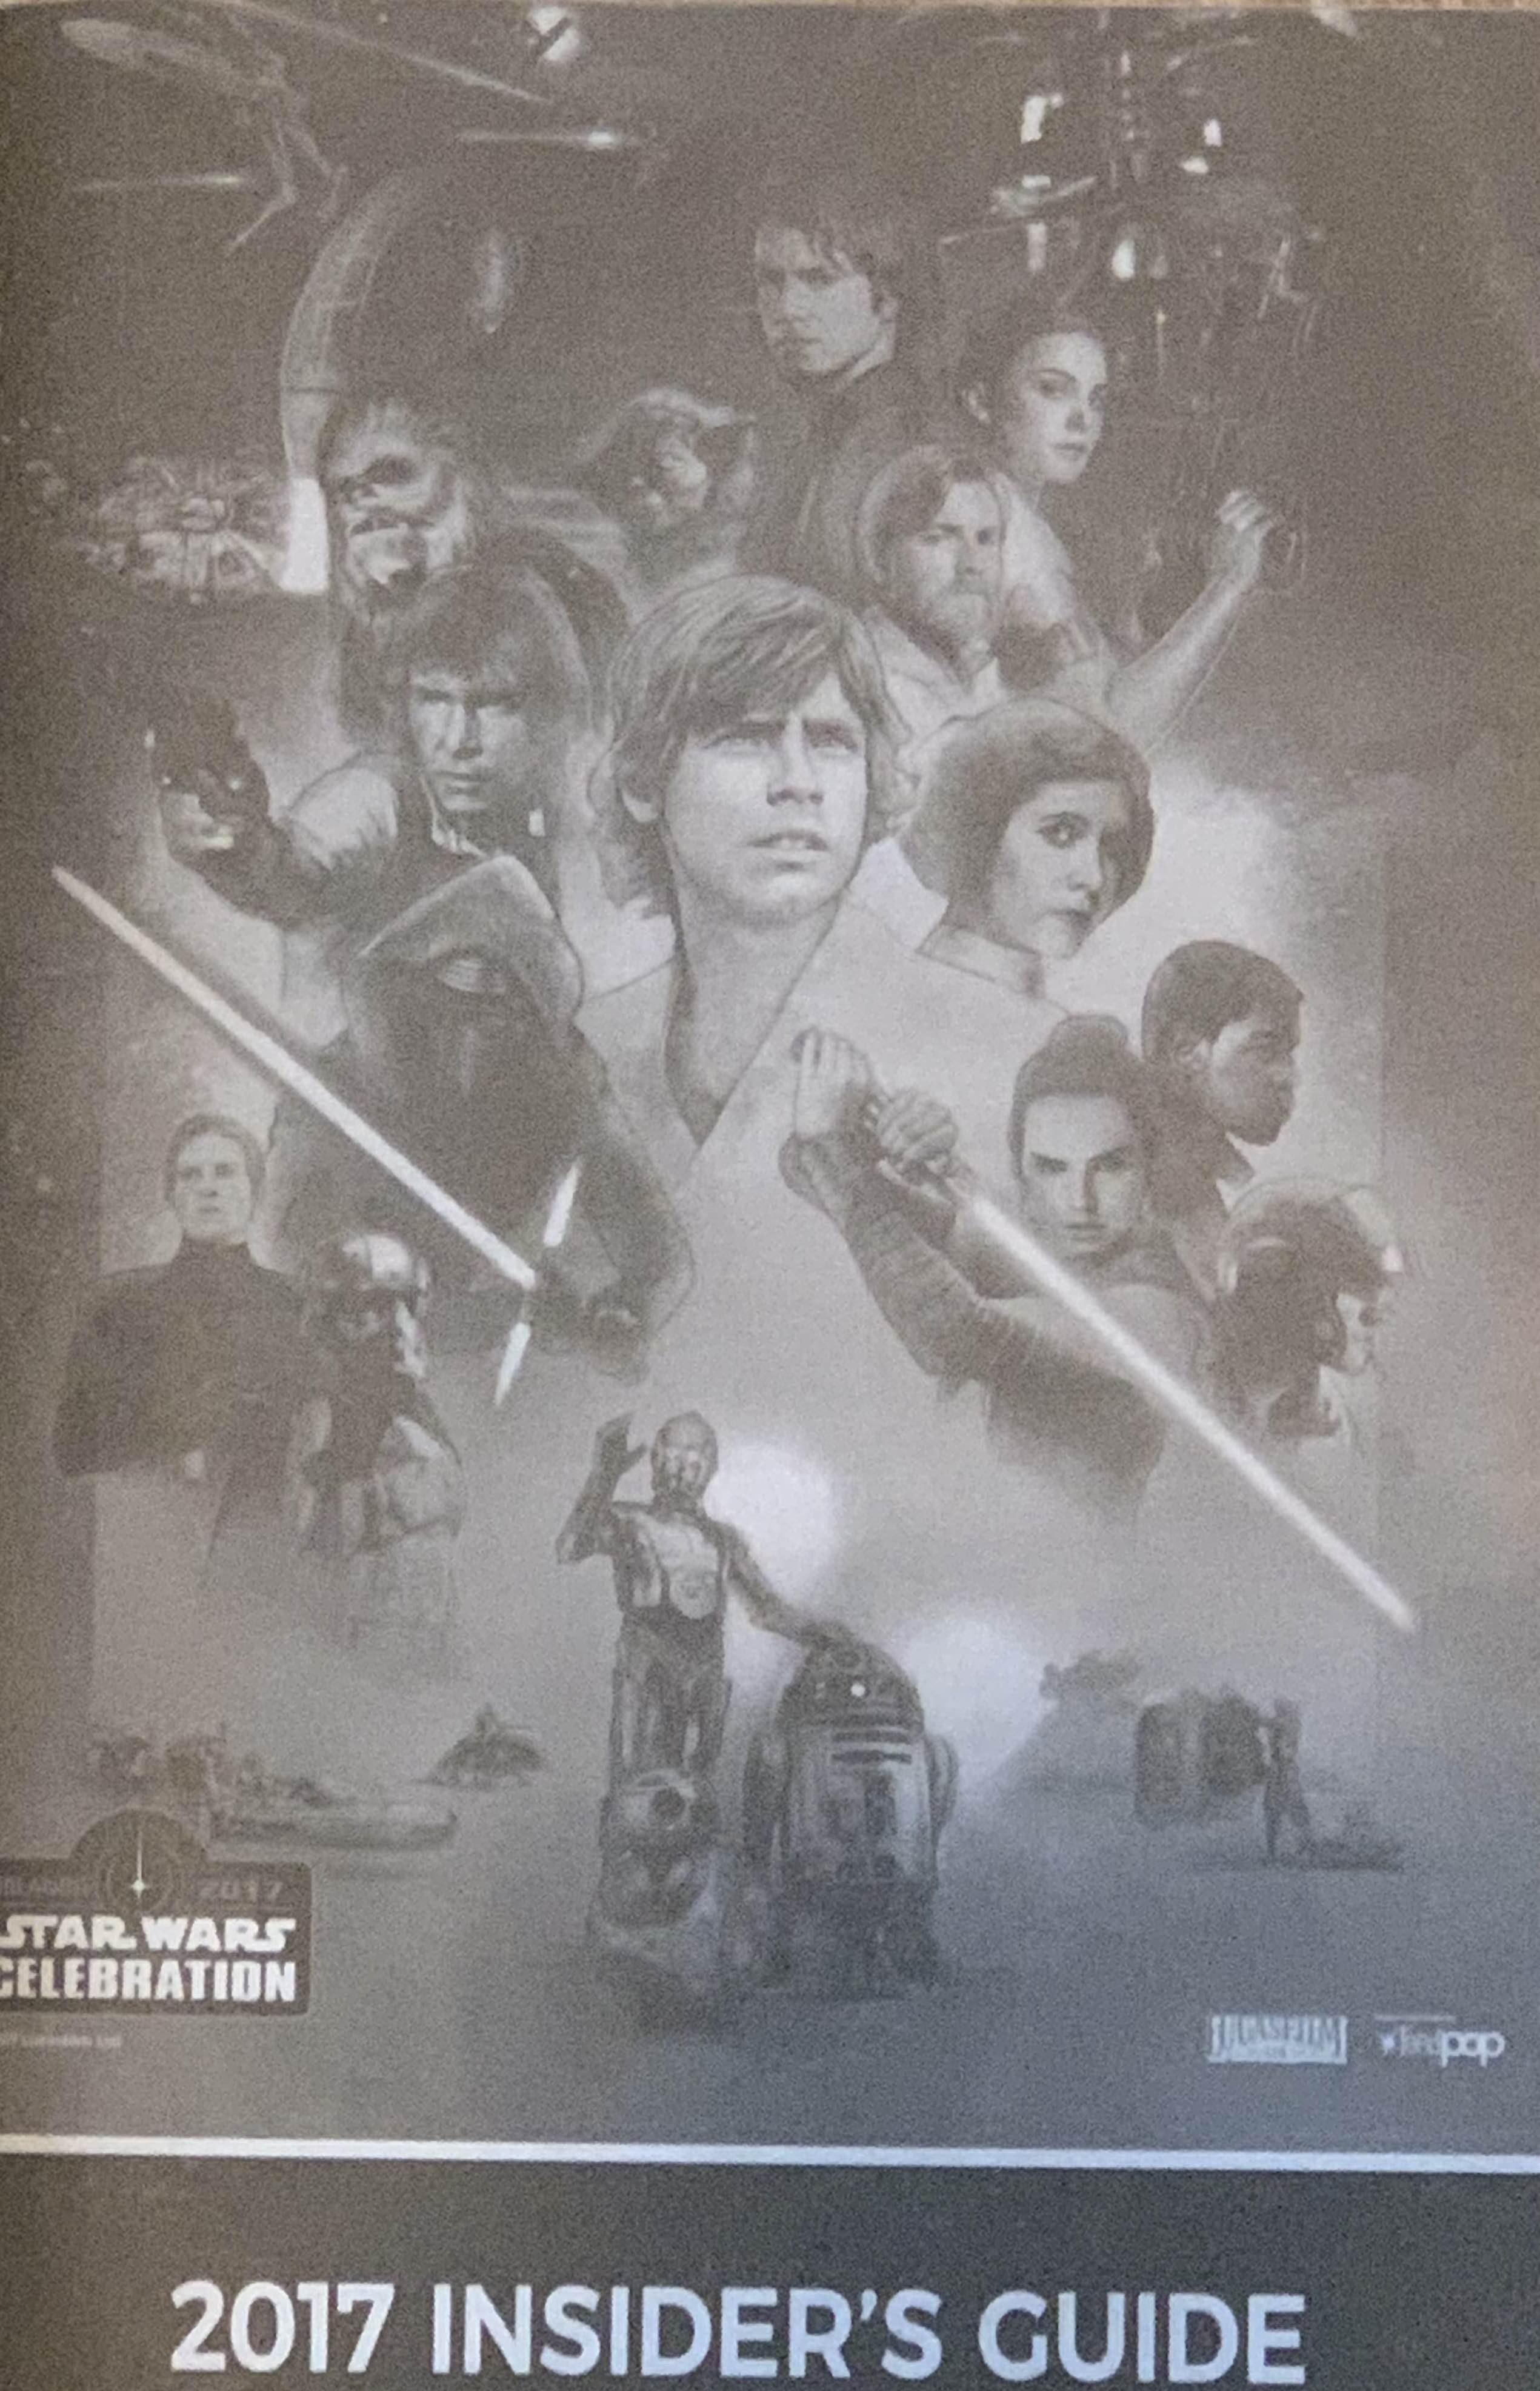 Star Wars Celebration Orlando 2017 Insider's Guide